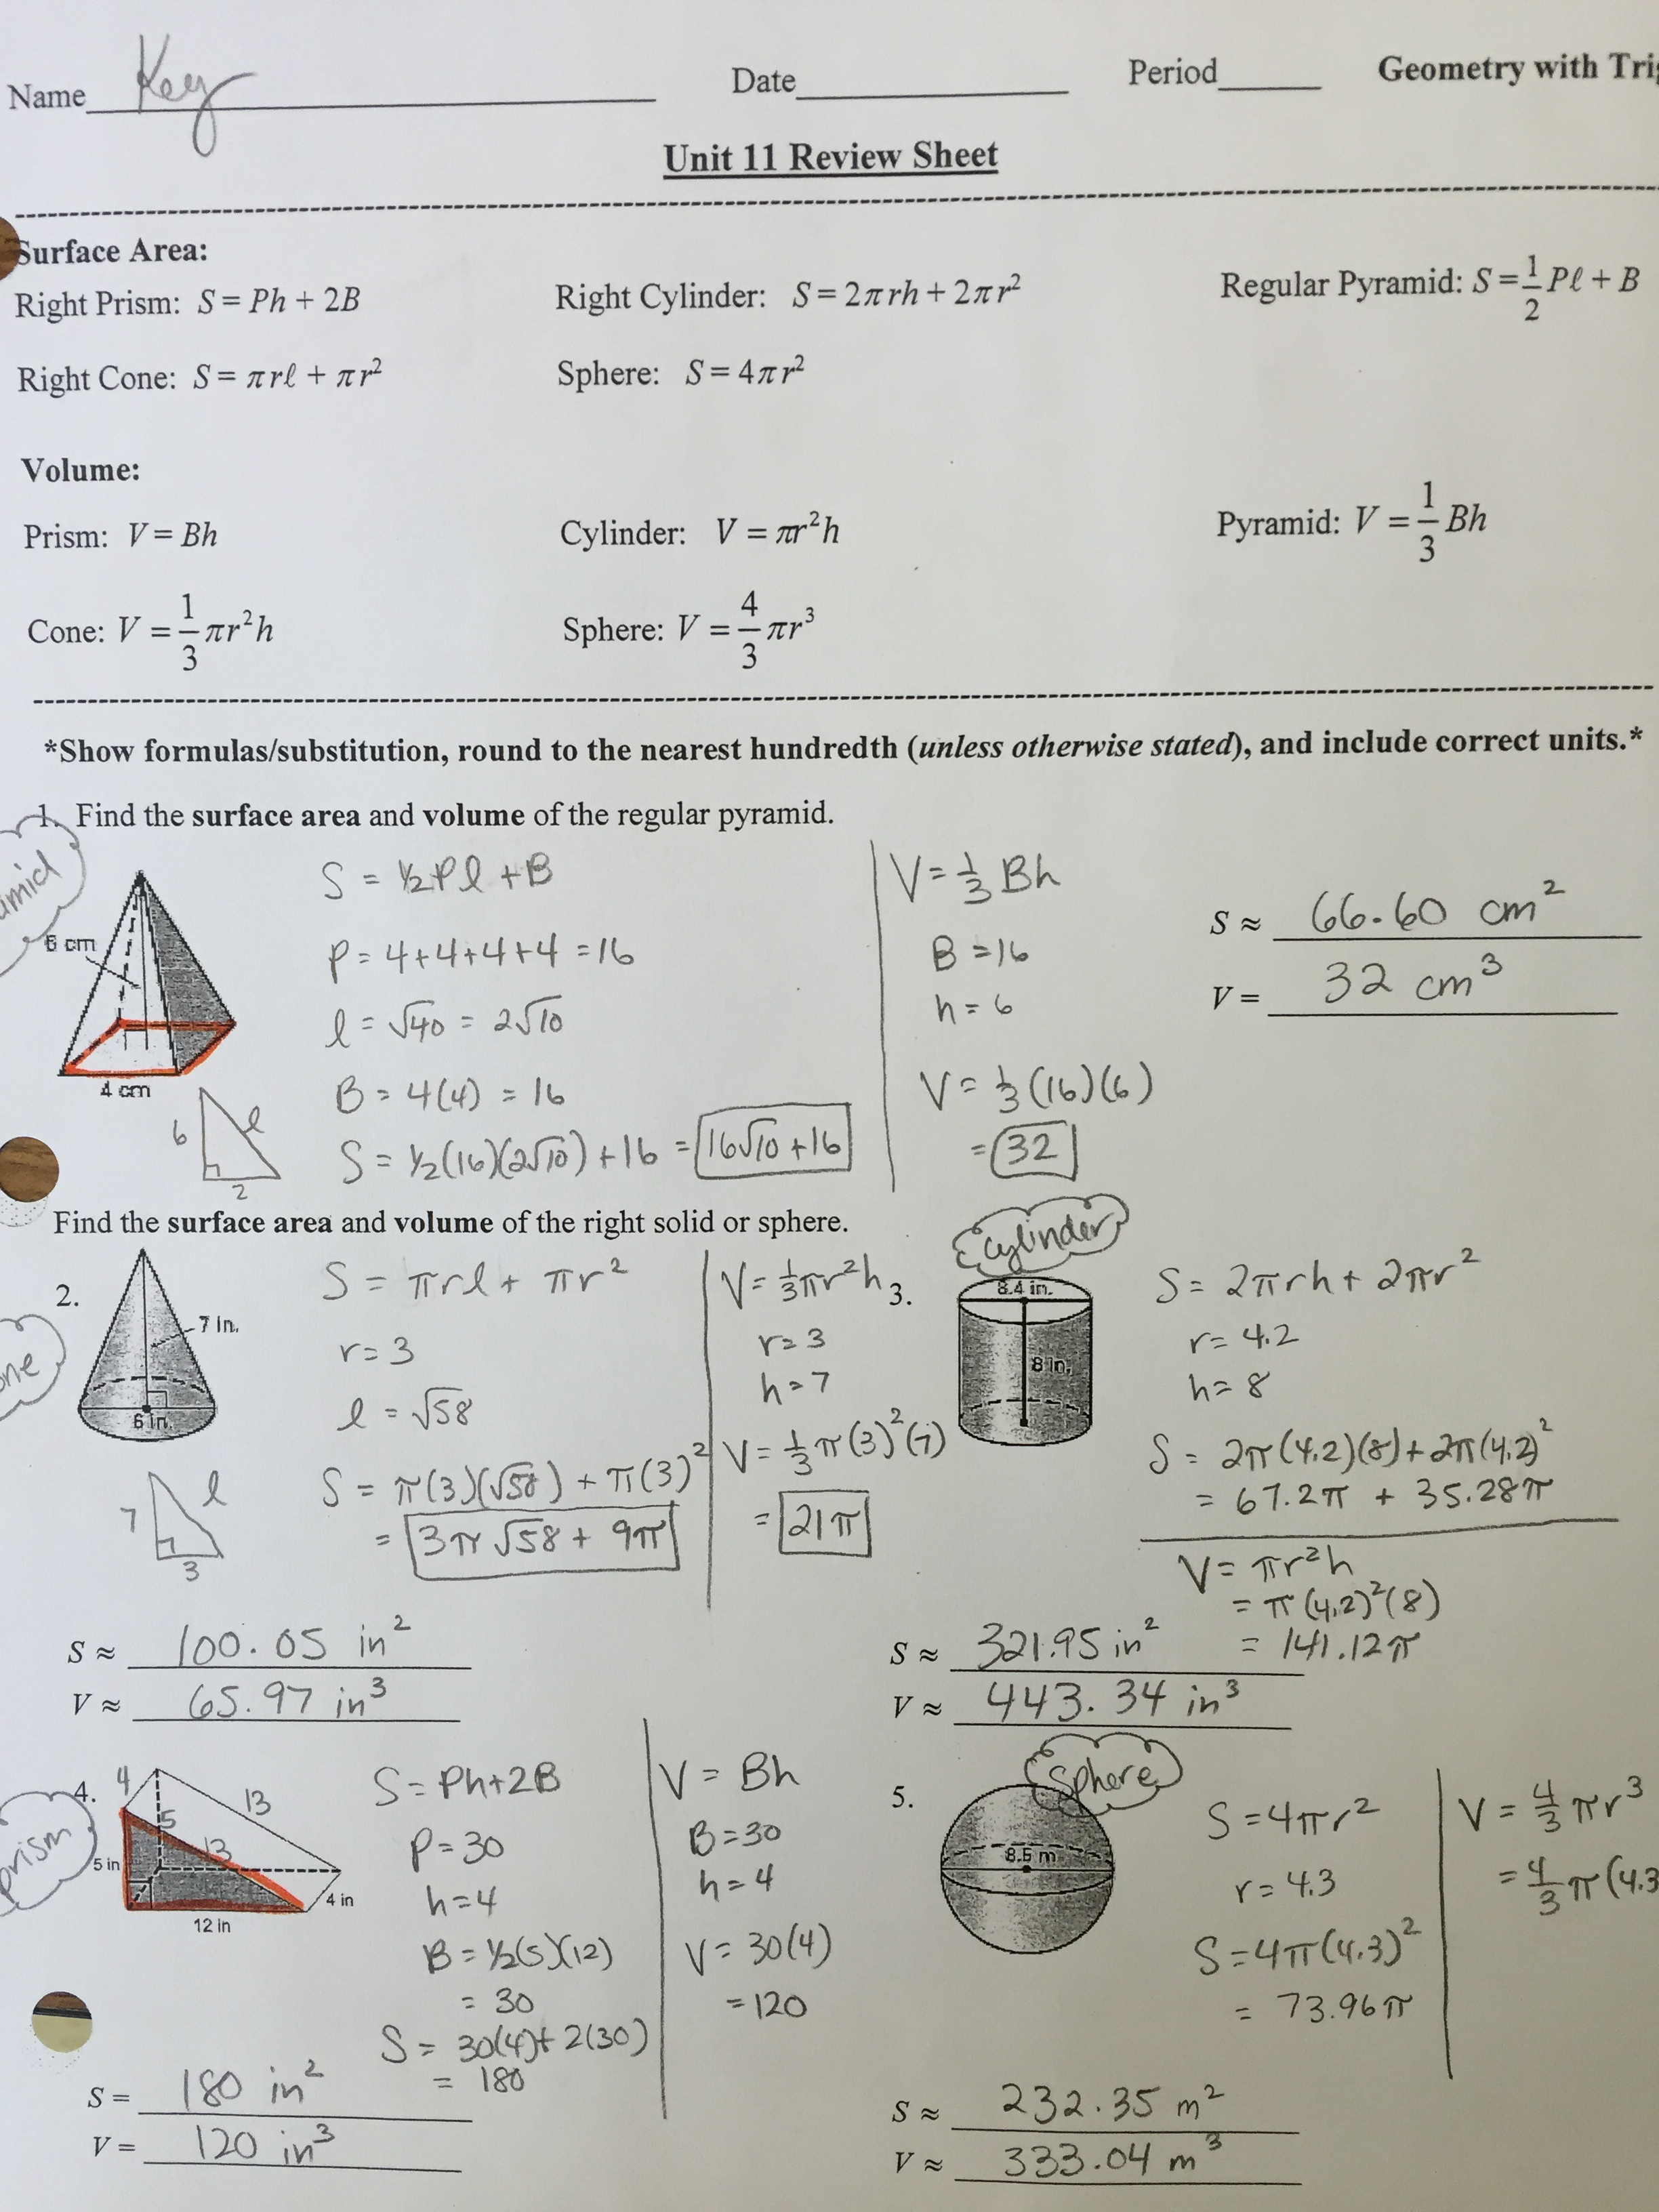 CRUPI, ERIN / Geometry